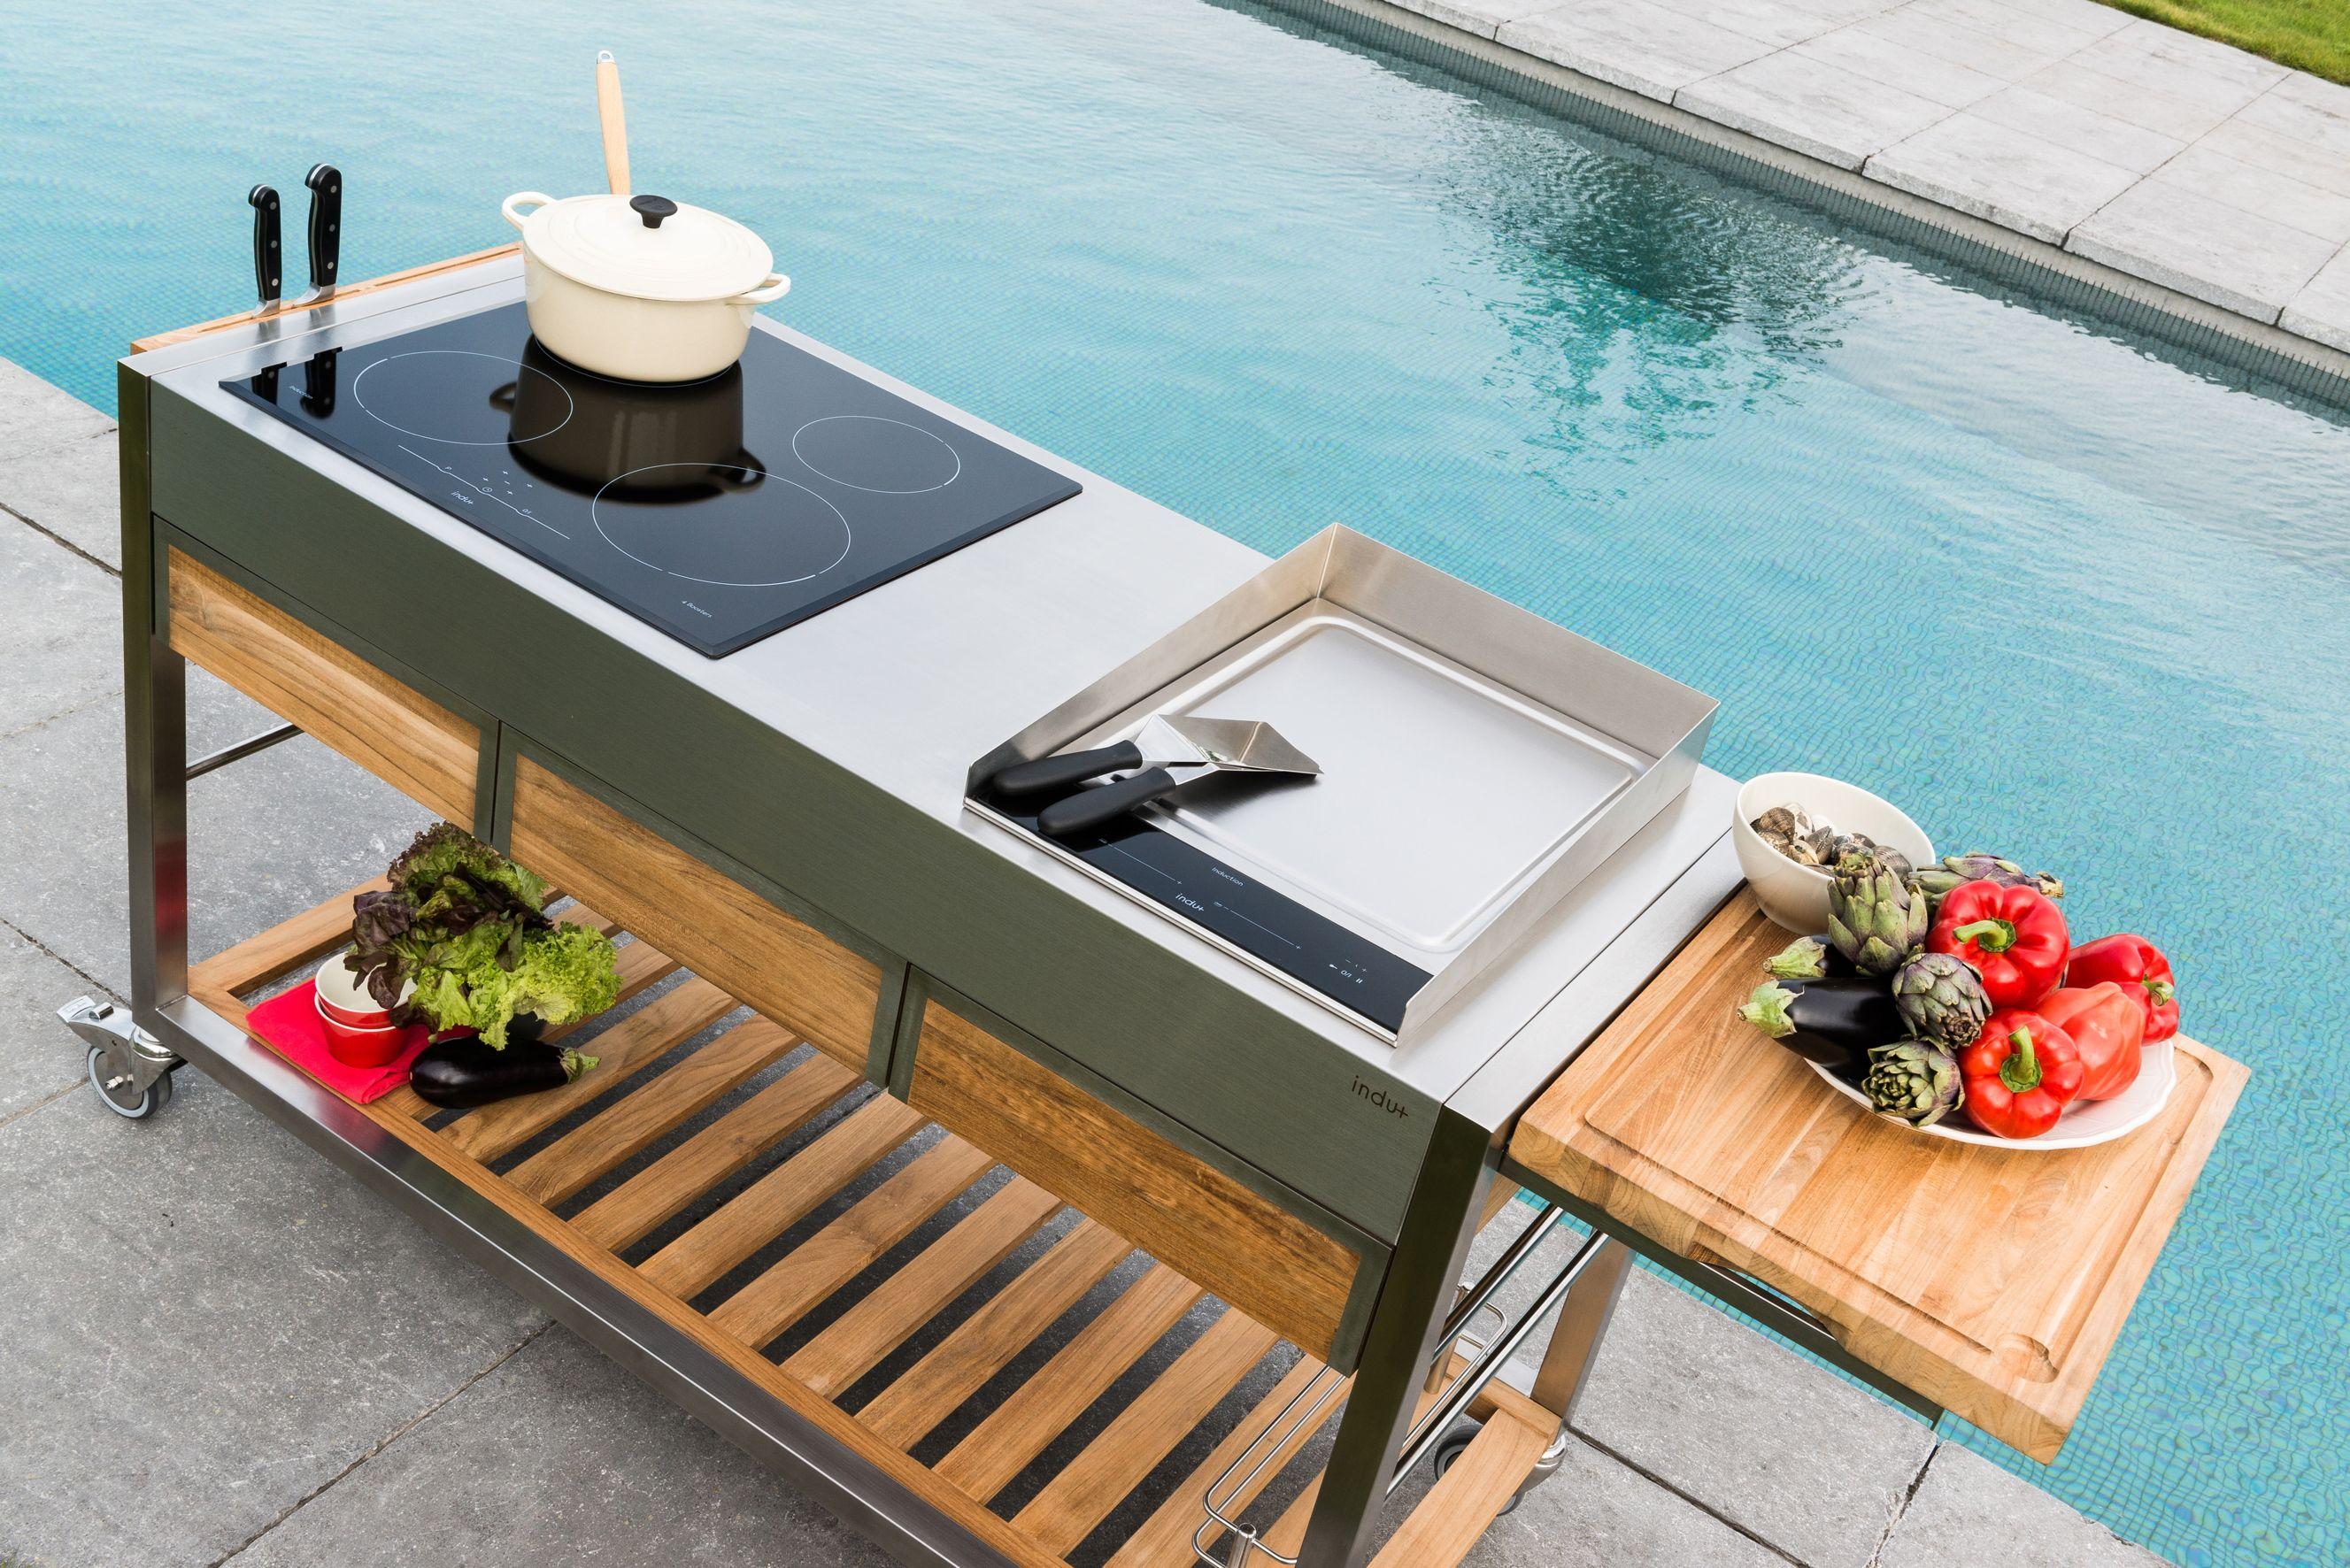 INDU+ TomBoy Teak mobile outdoor kitchen | INDU+ | Pinterest